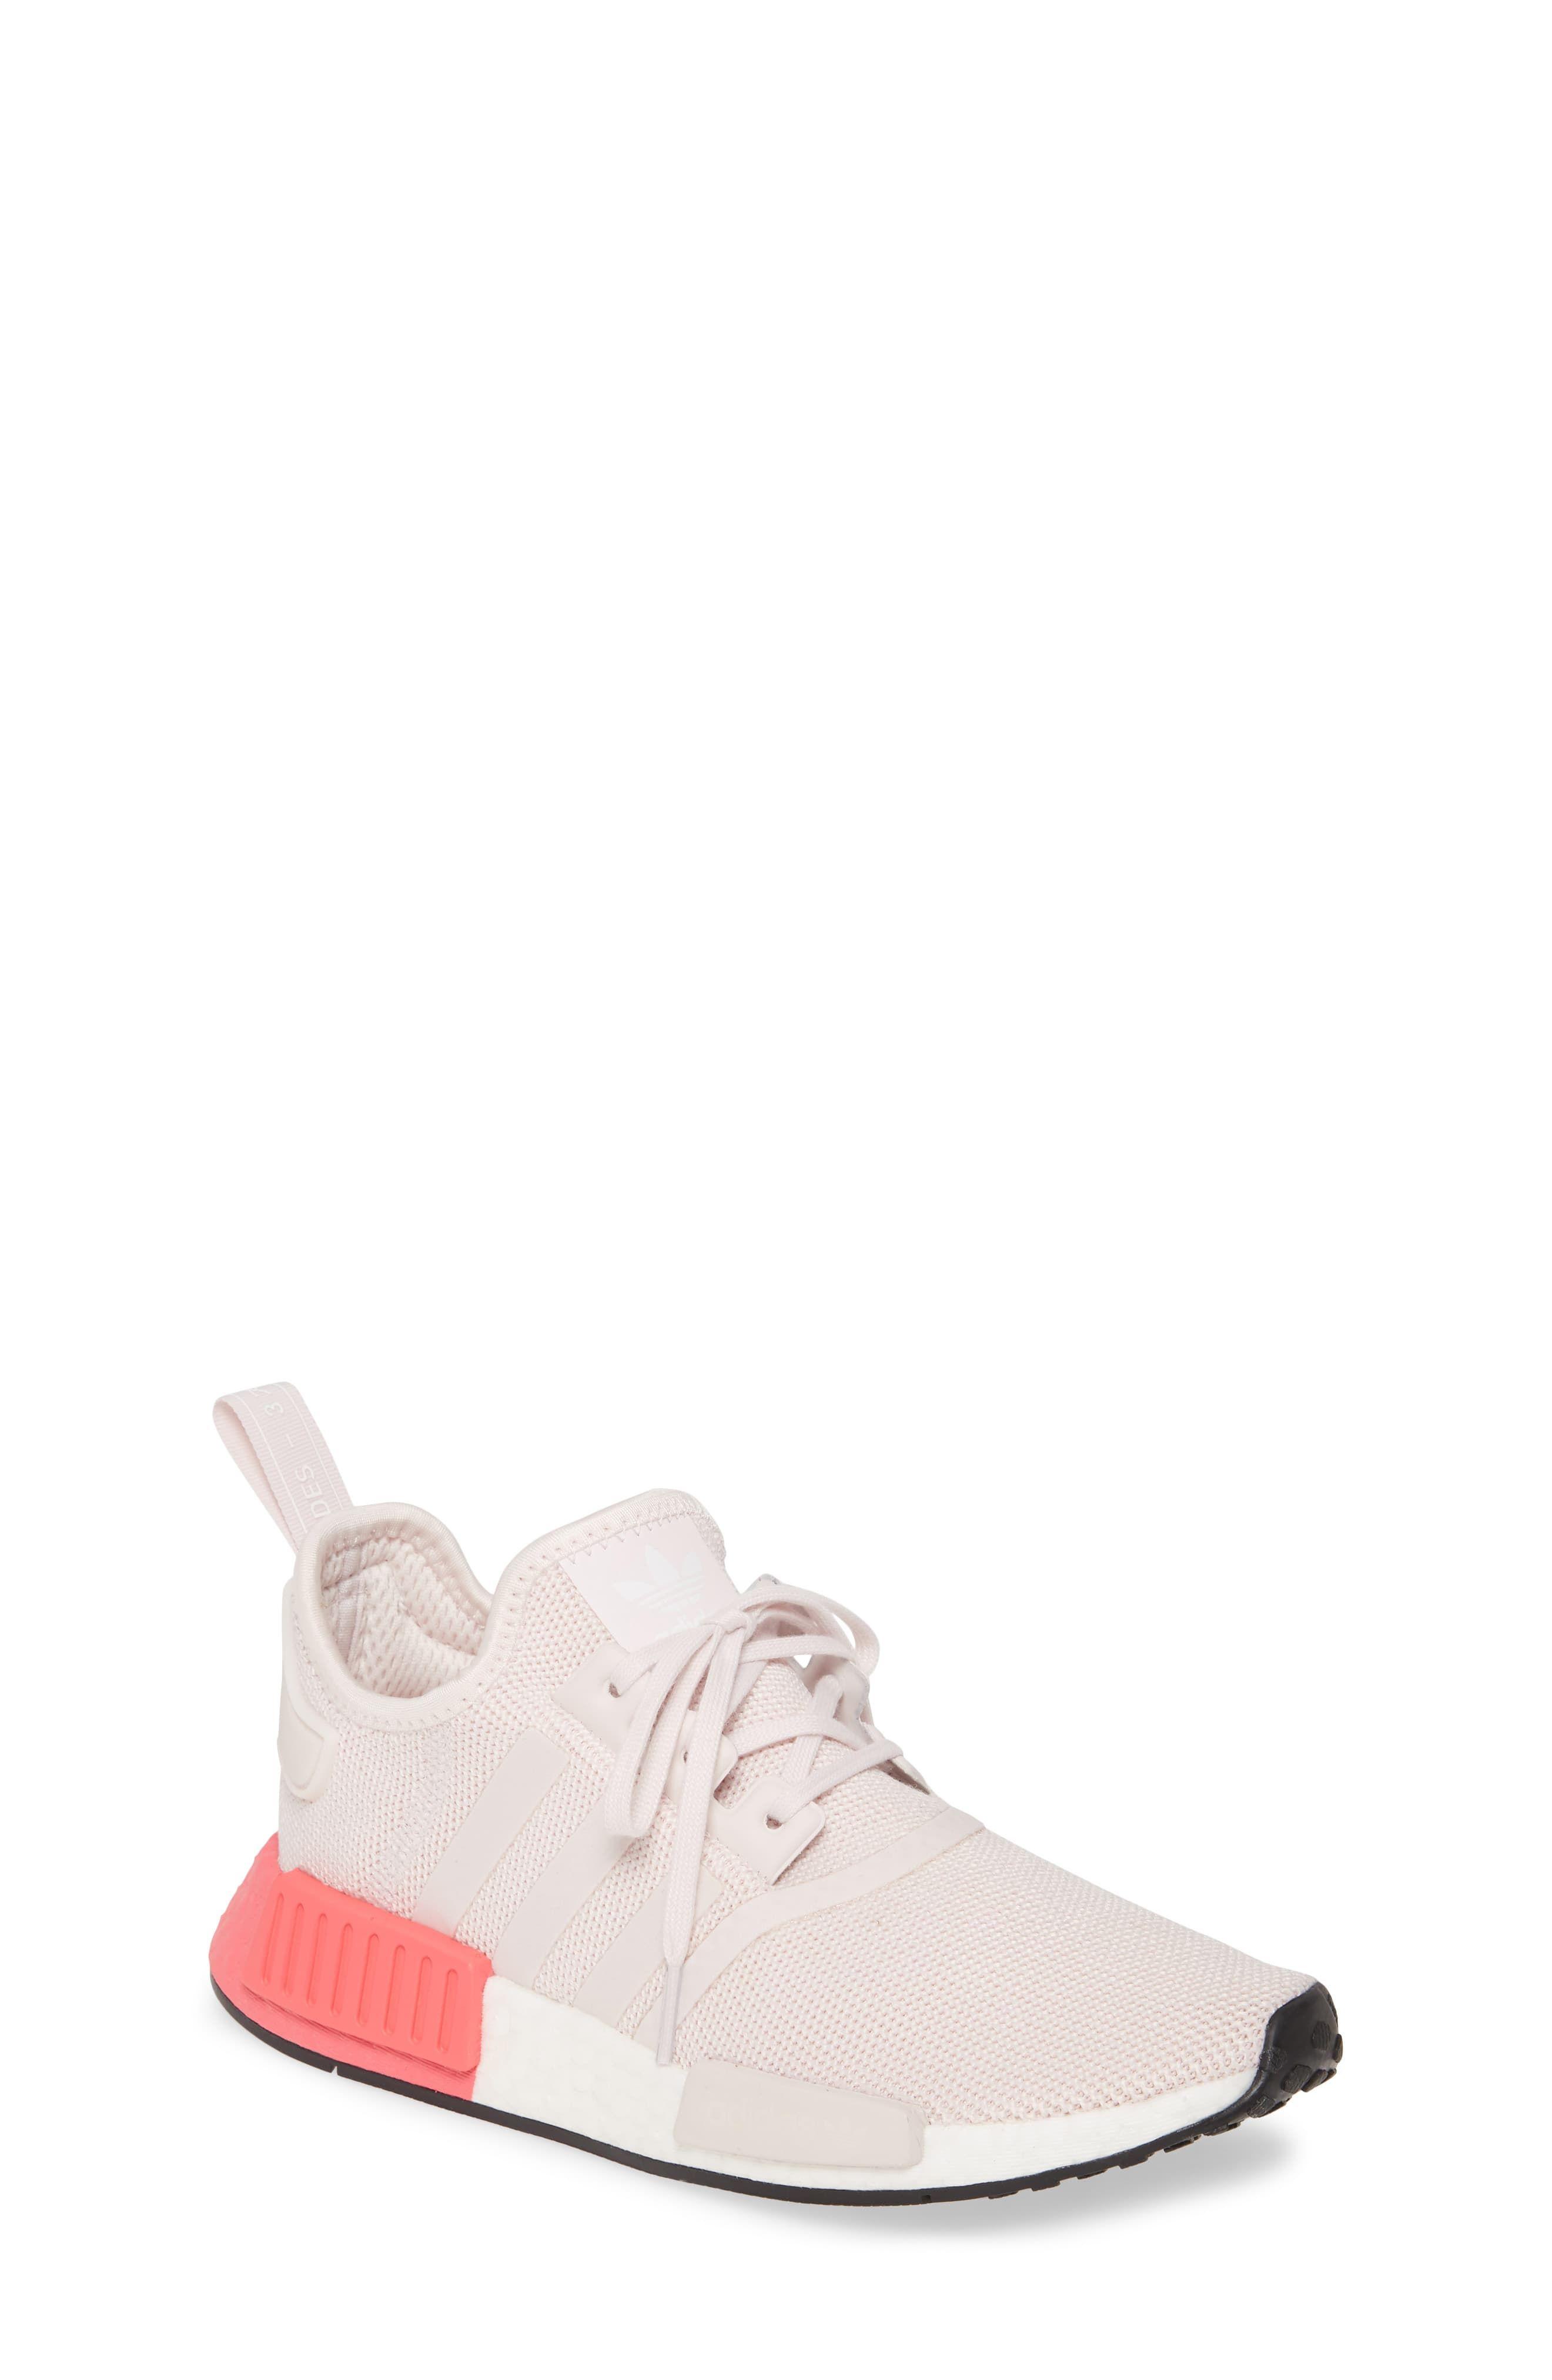 nmd adidas kids